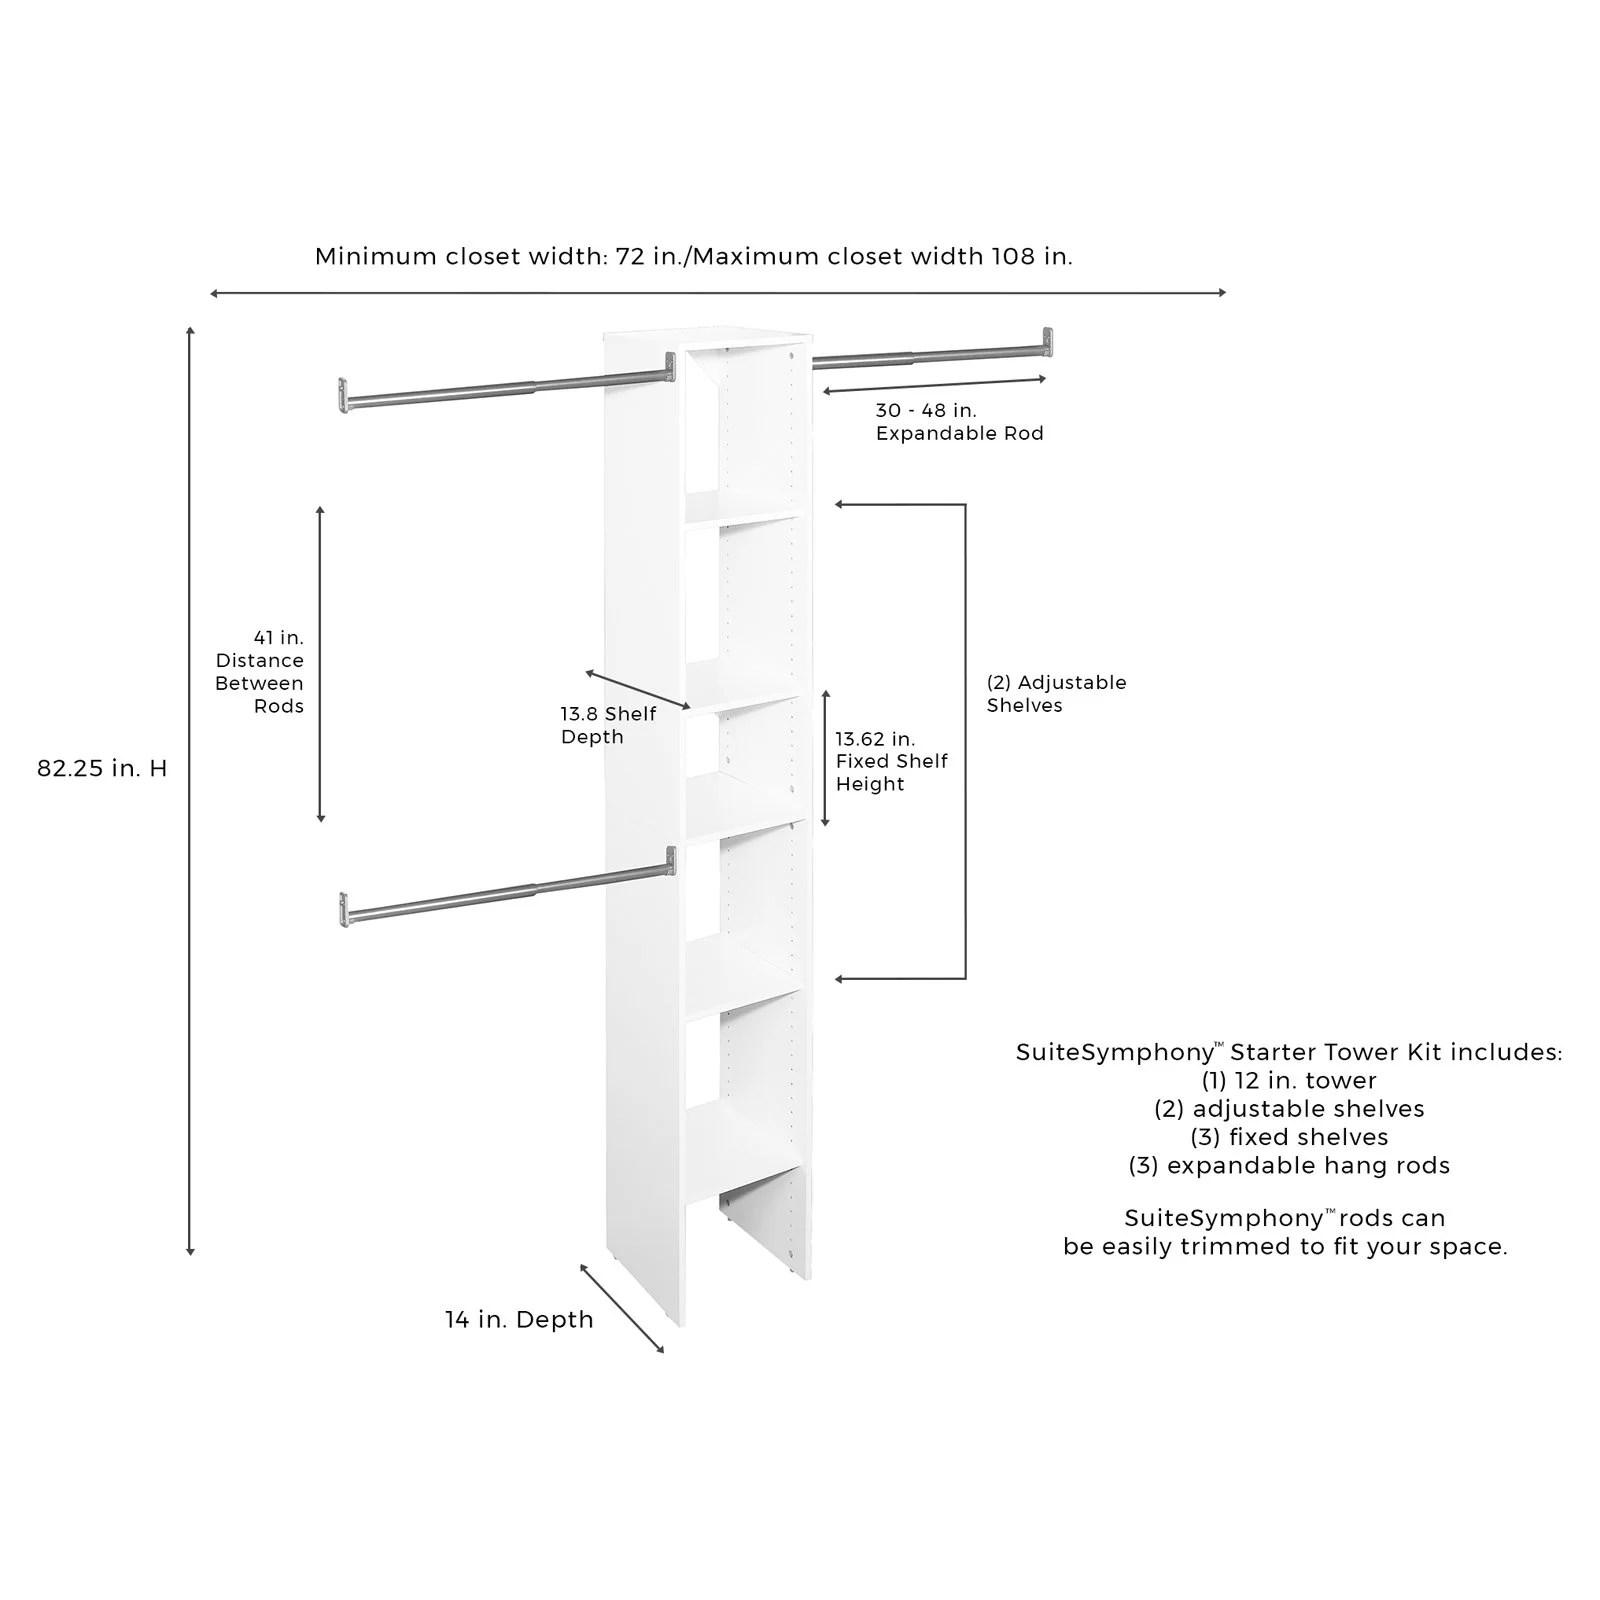 Closetmaid Suitesymphony 12 In Tower Starter Kit Walmart Com